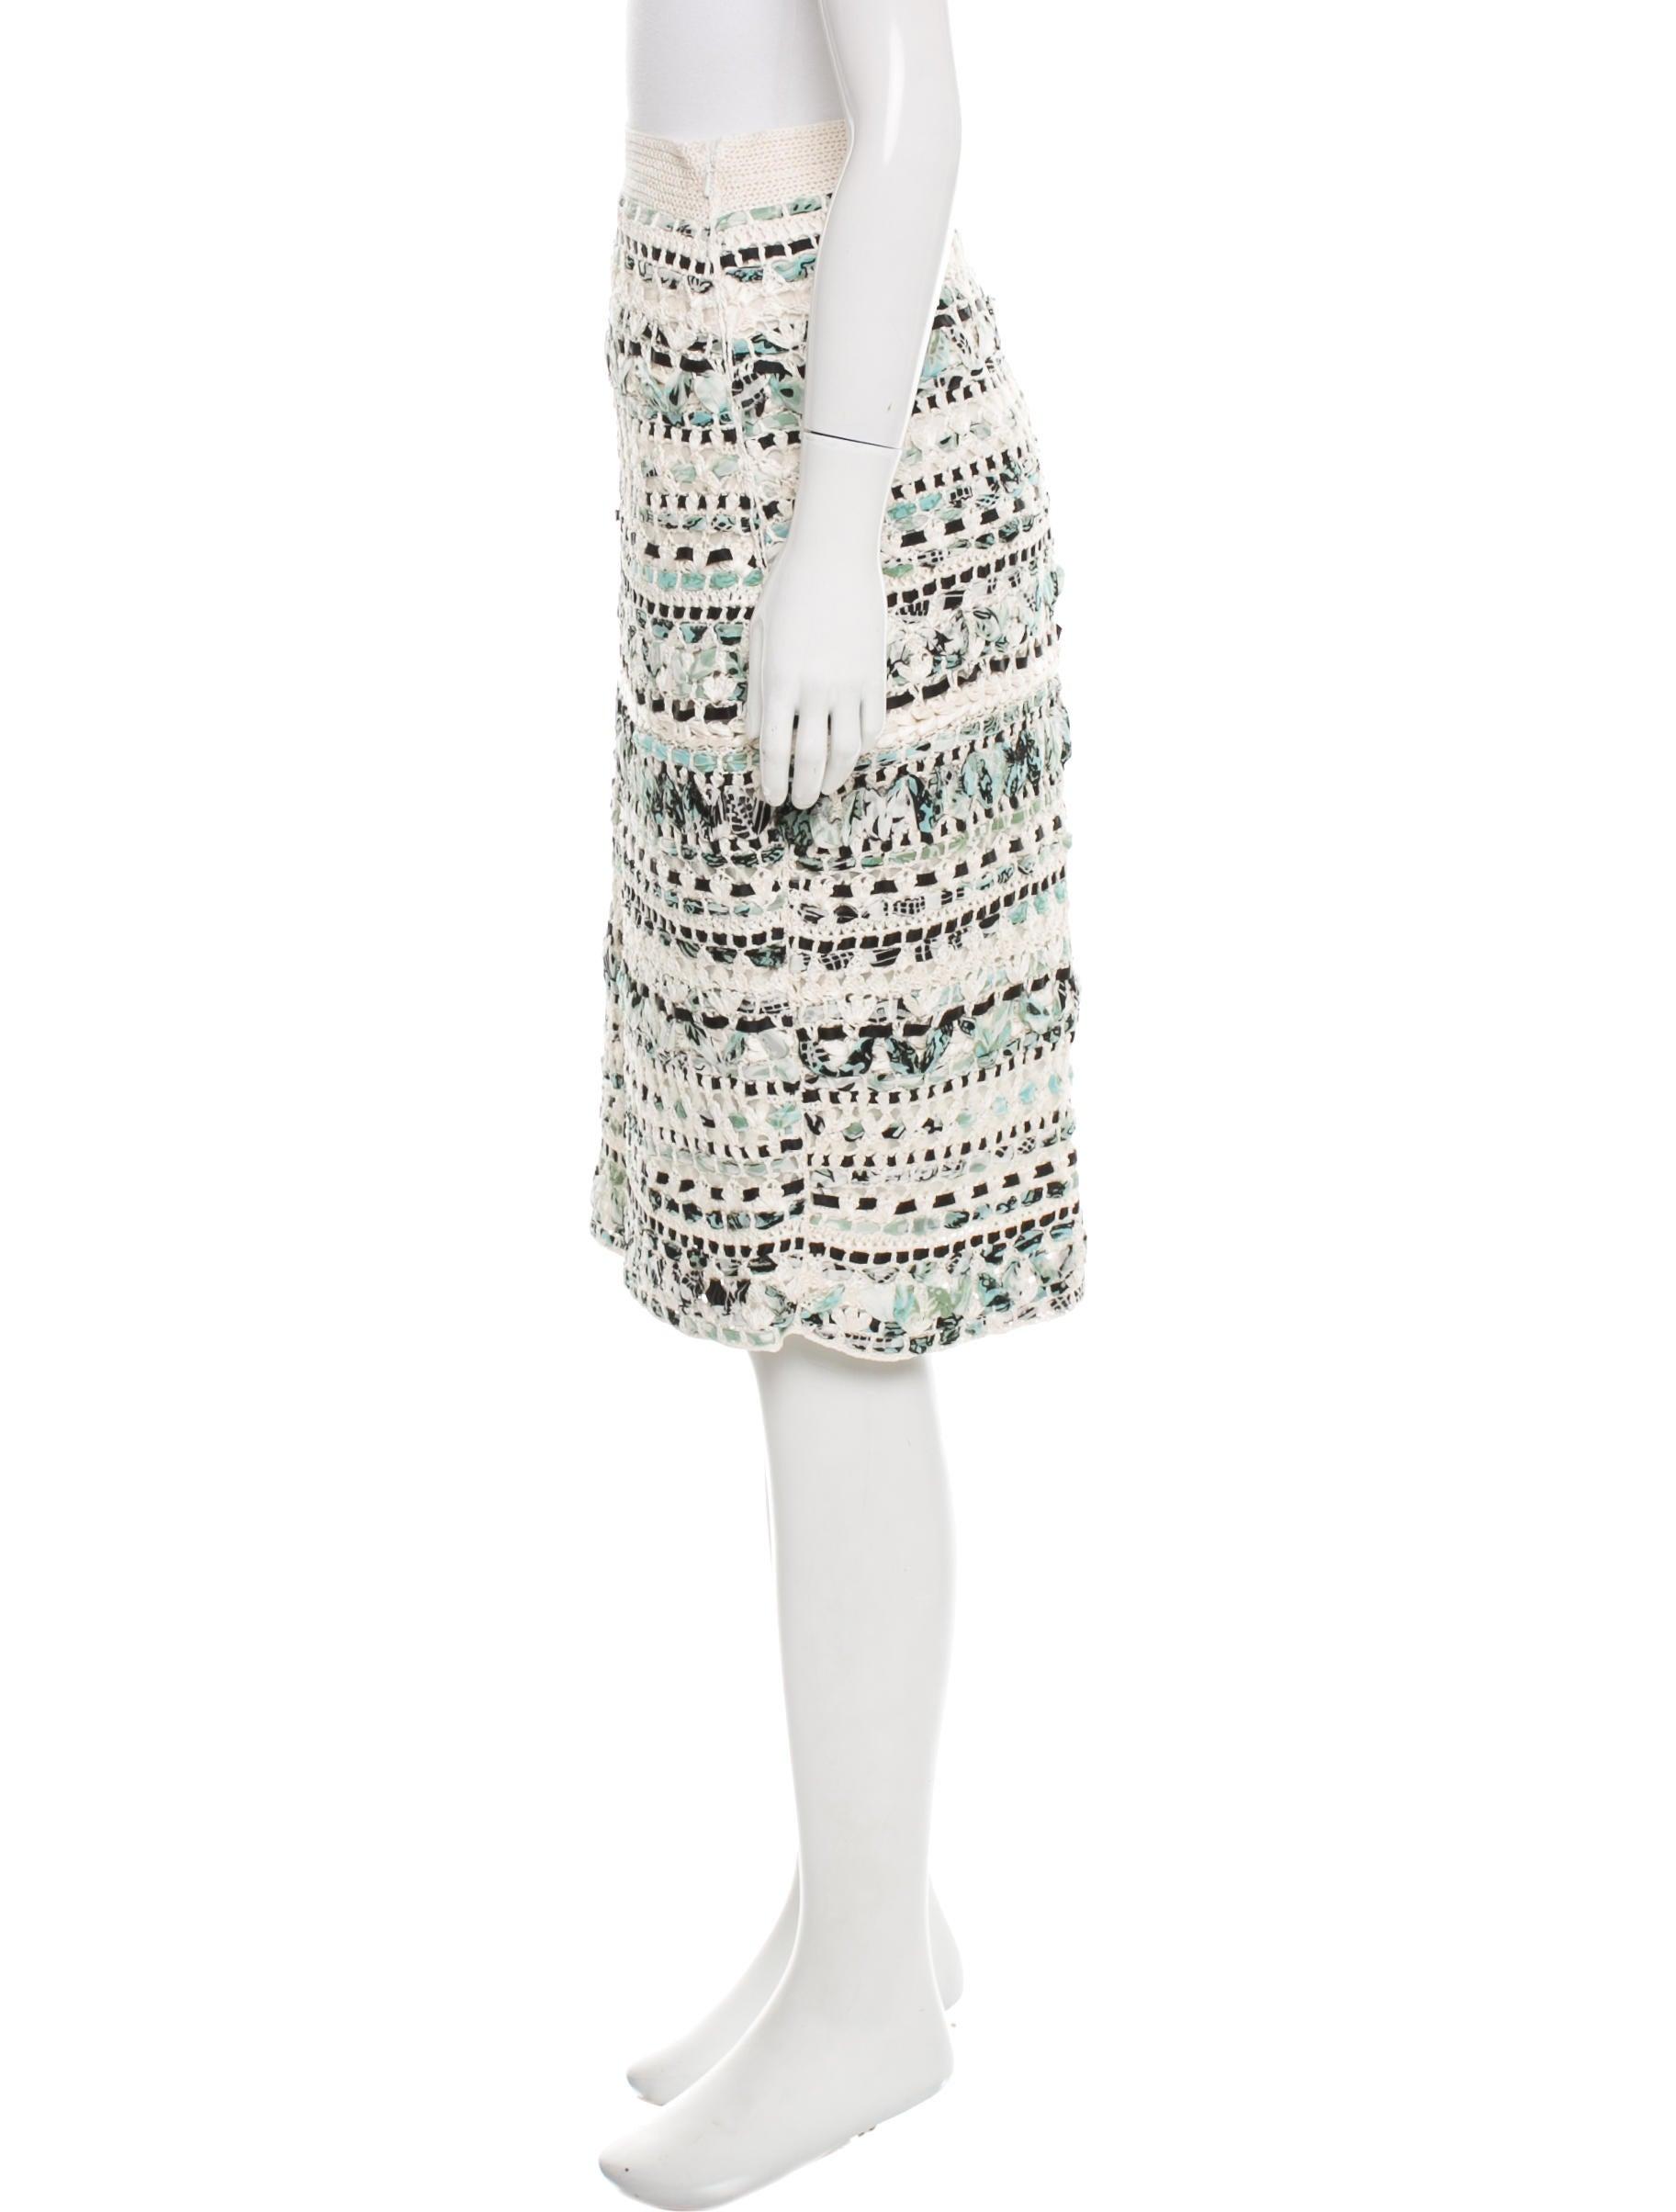 Oscar de la renta hand knit pencil skirt clothing for Oscar de la renta candles